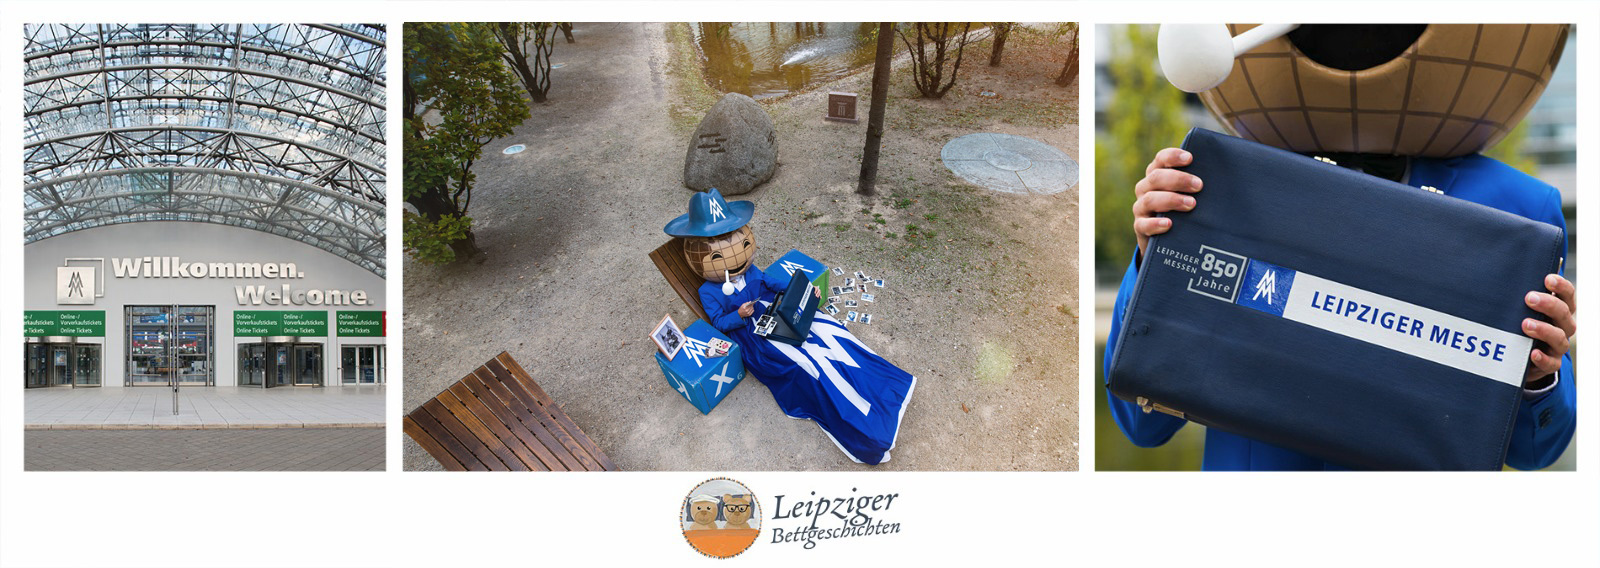 Leipziger_Bettgeschichten_LM